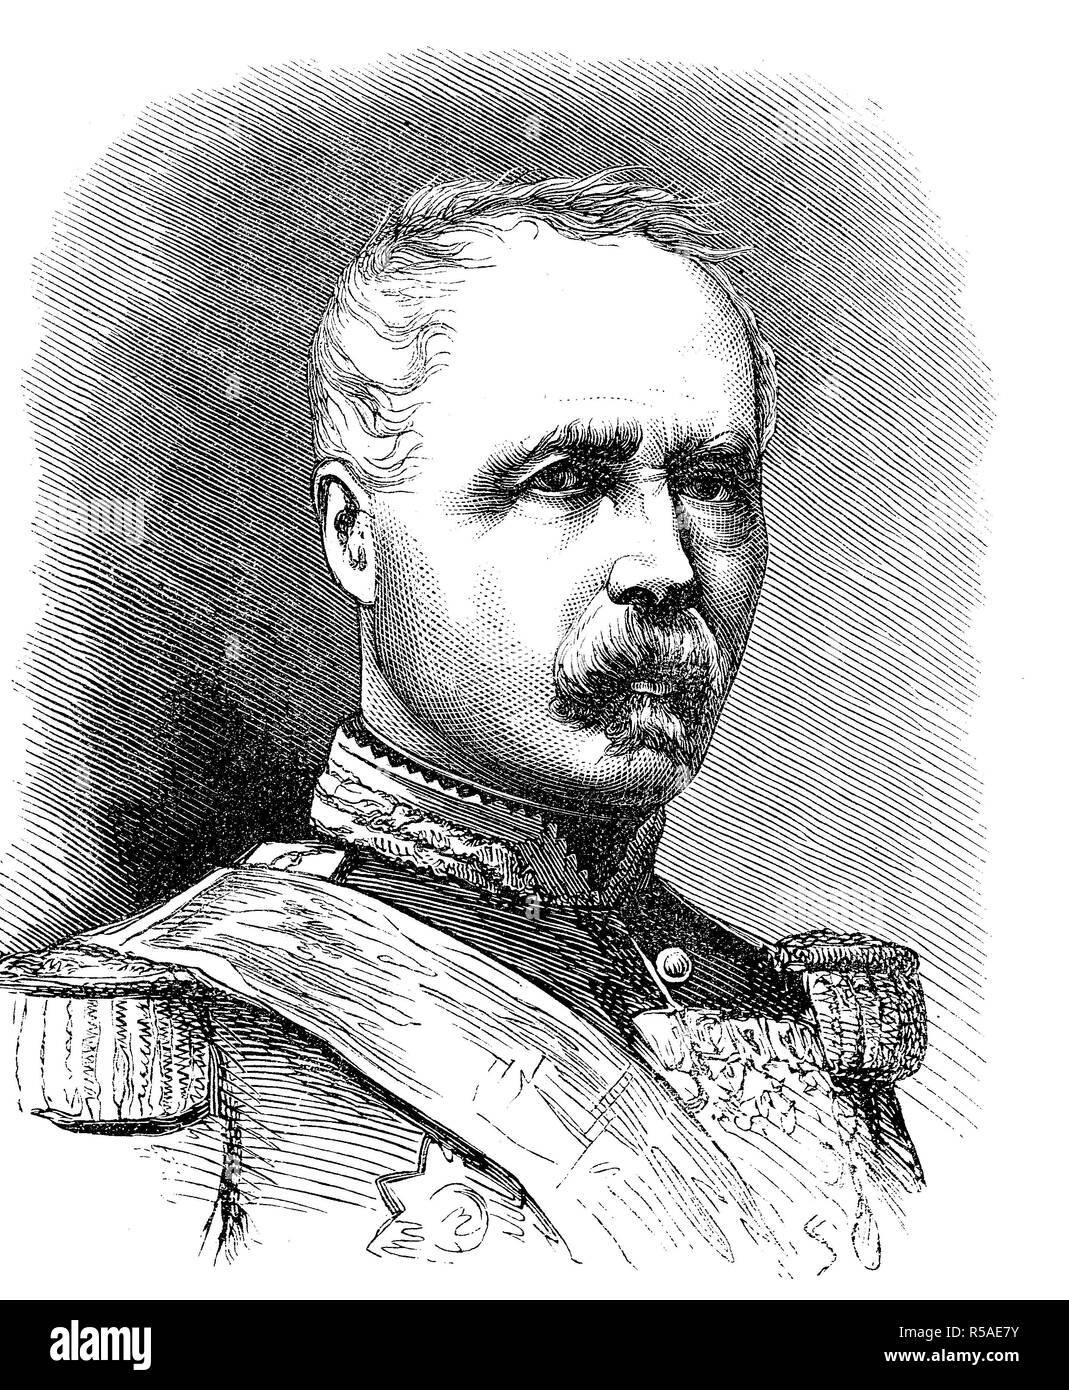 The President-Marshal Marie Esme Patrice Maurice, Count de Mac Mahon, The Duke of Magenta, 13 June 1808, 17 October 1893 - Stock Image